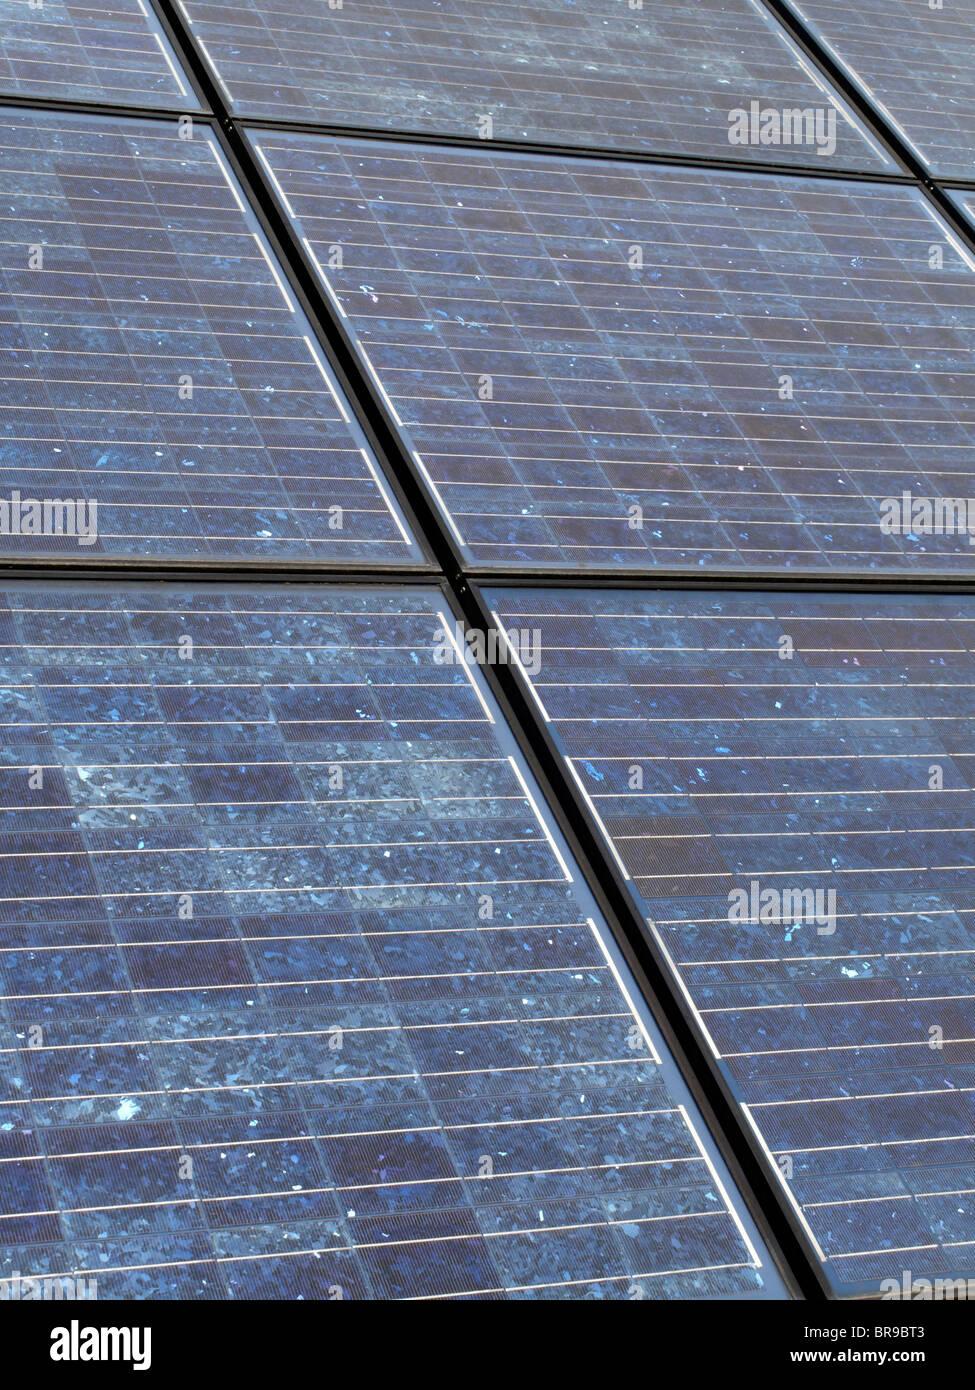 Solarcells - energía solar Imagen De Stock